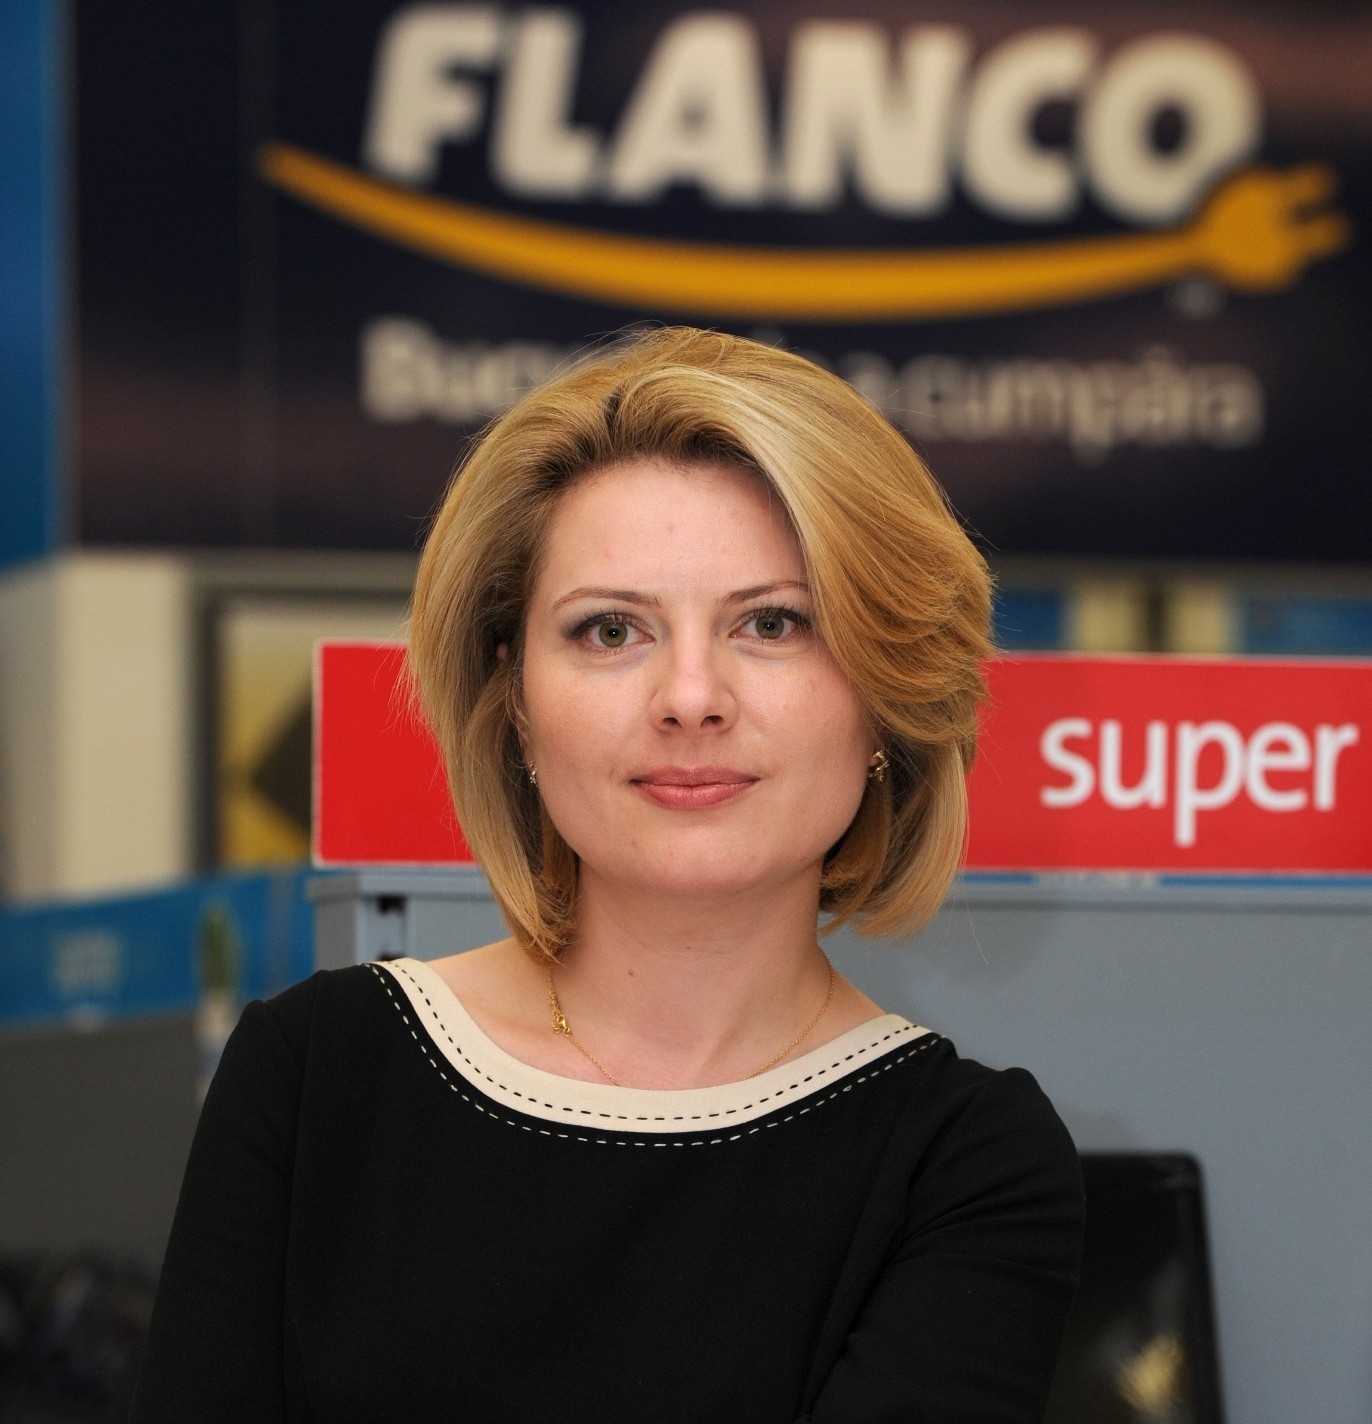 Violeta Luca, marketing director Flanco